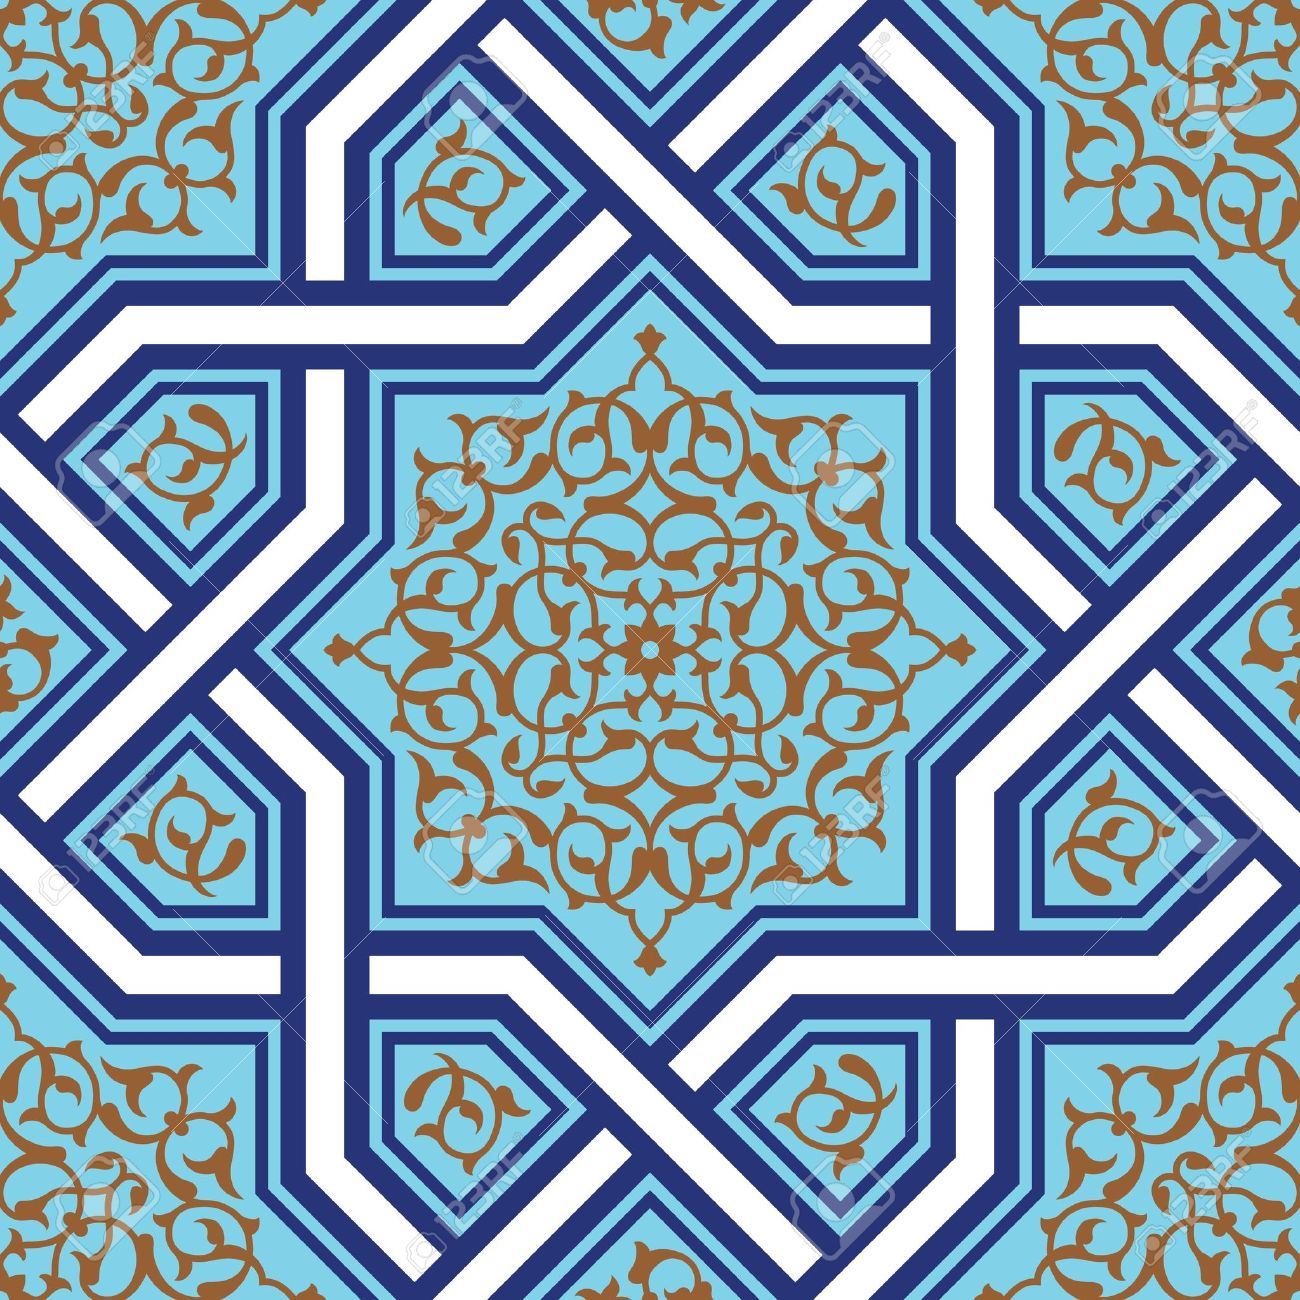 Magnificent 16X32 Ceiling Tiles Big 18 Inch Floor Tile Regular 18 X 18 Ceramic Tile 20 X 20 Floor Tile Patterns Old 24 X 24 Ceiling Tiles Blue3 X 12 Subway Tile Traditional Arabic Design Royalty Free Cliparts, Vectors, And ..